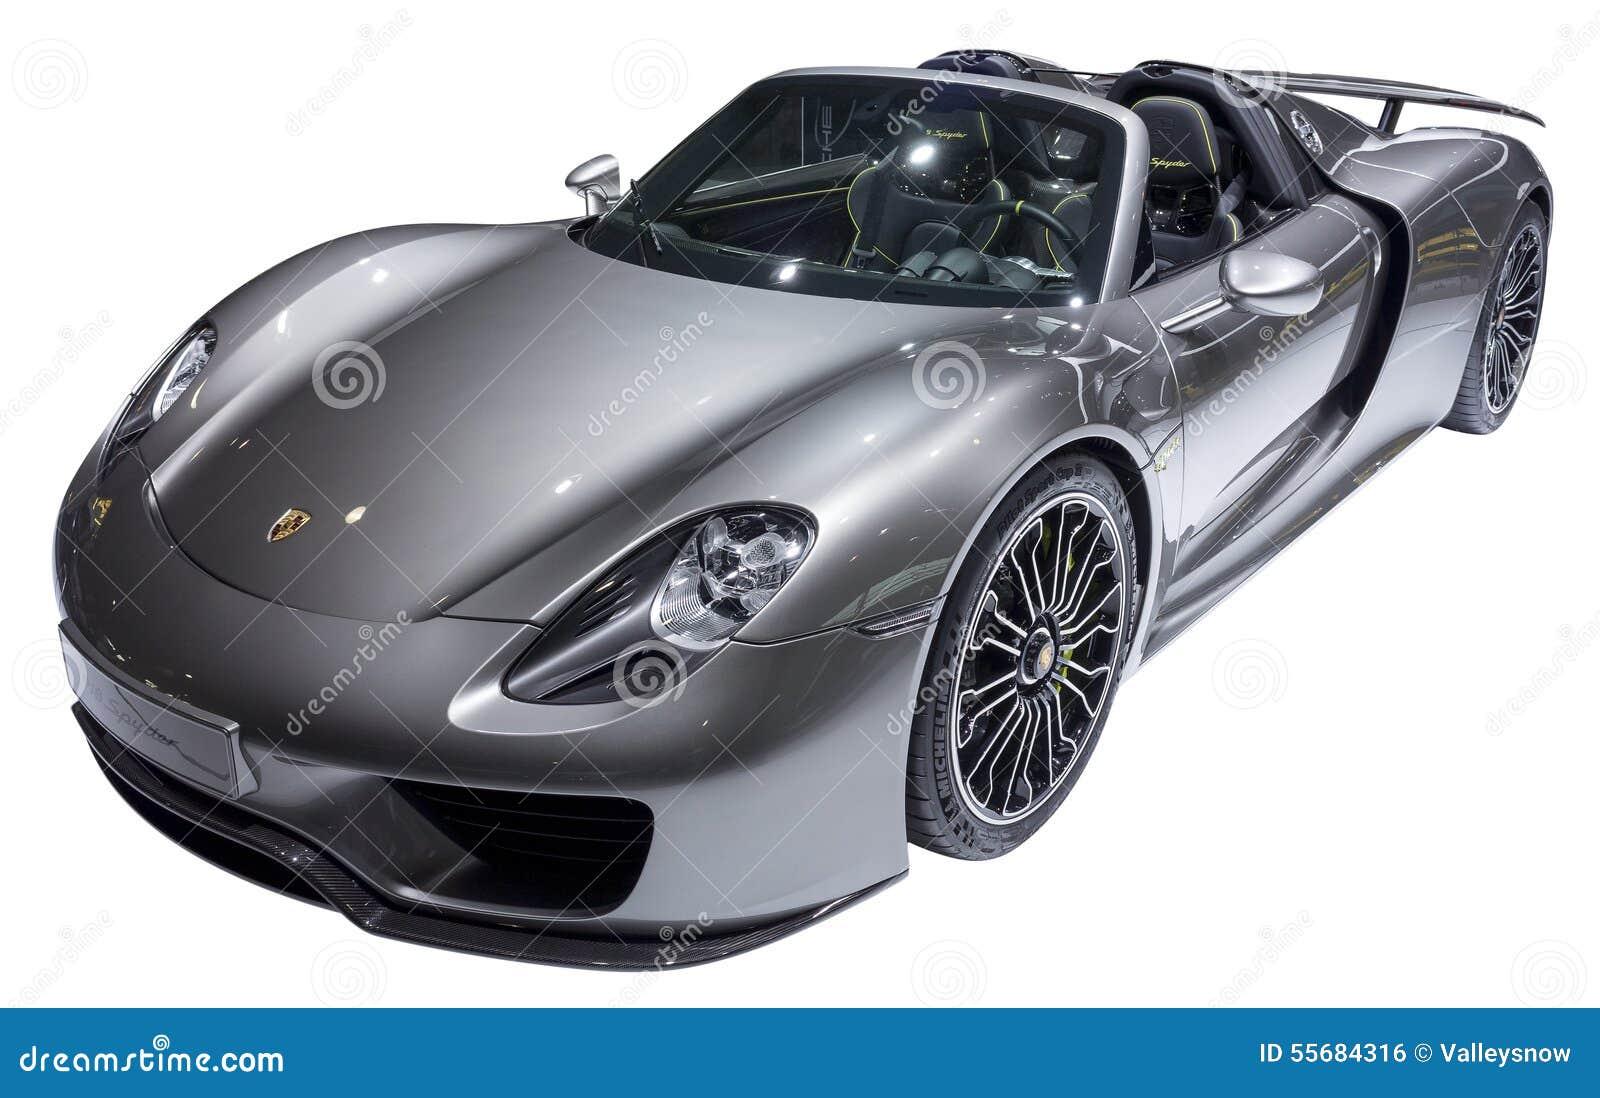 porsche sports car editorial photo image 55684316. Black Bedroom Furniture Sets. Home Design Ideas